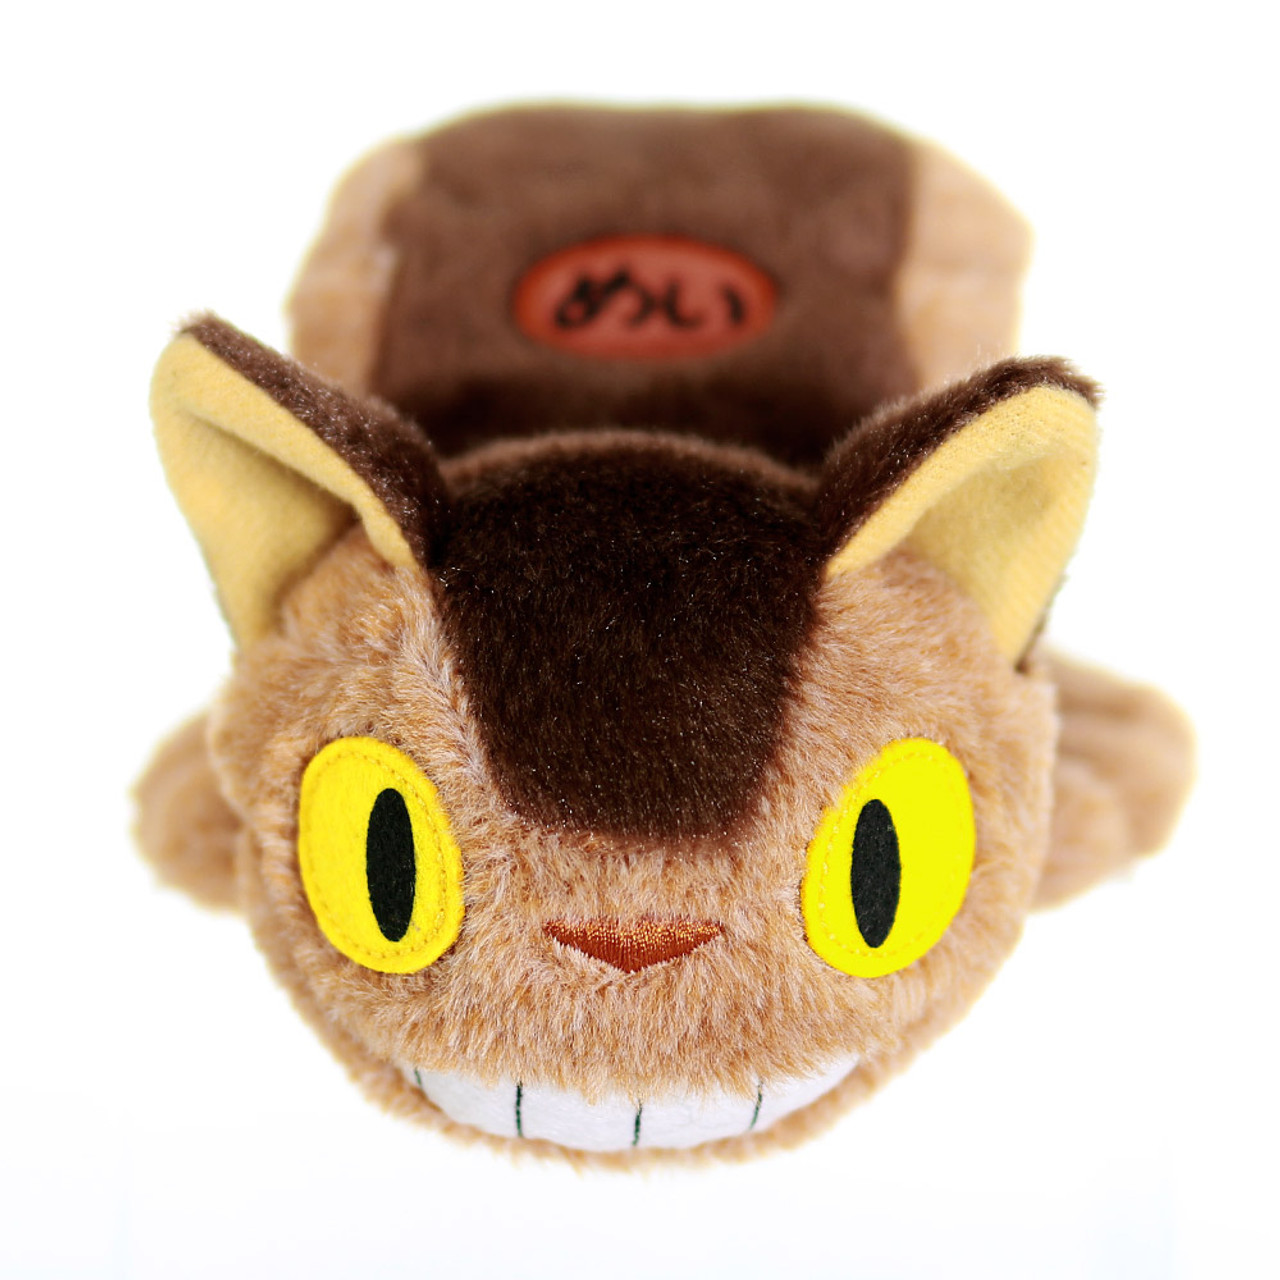 Cute Sweet Studio Ghibli Totoro Catbus Stuffed Animal Toy ( Front View )